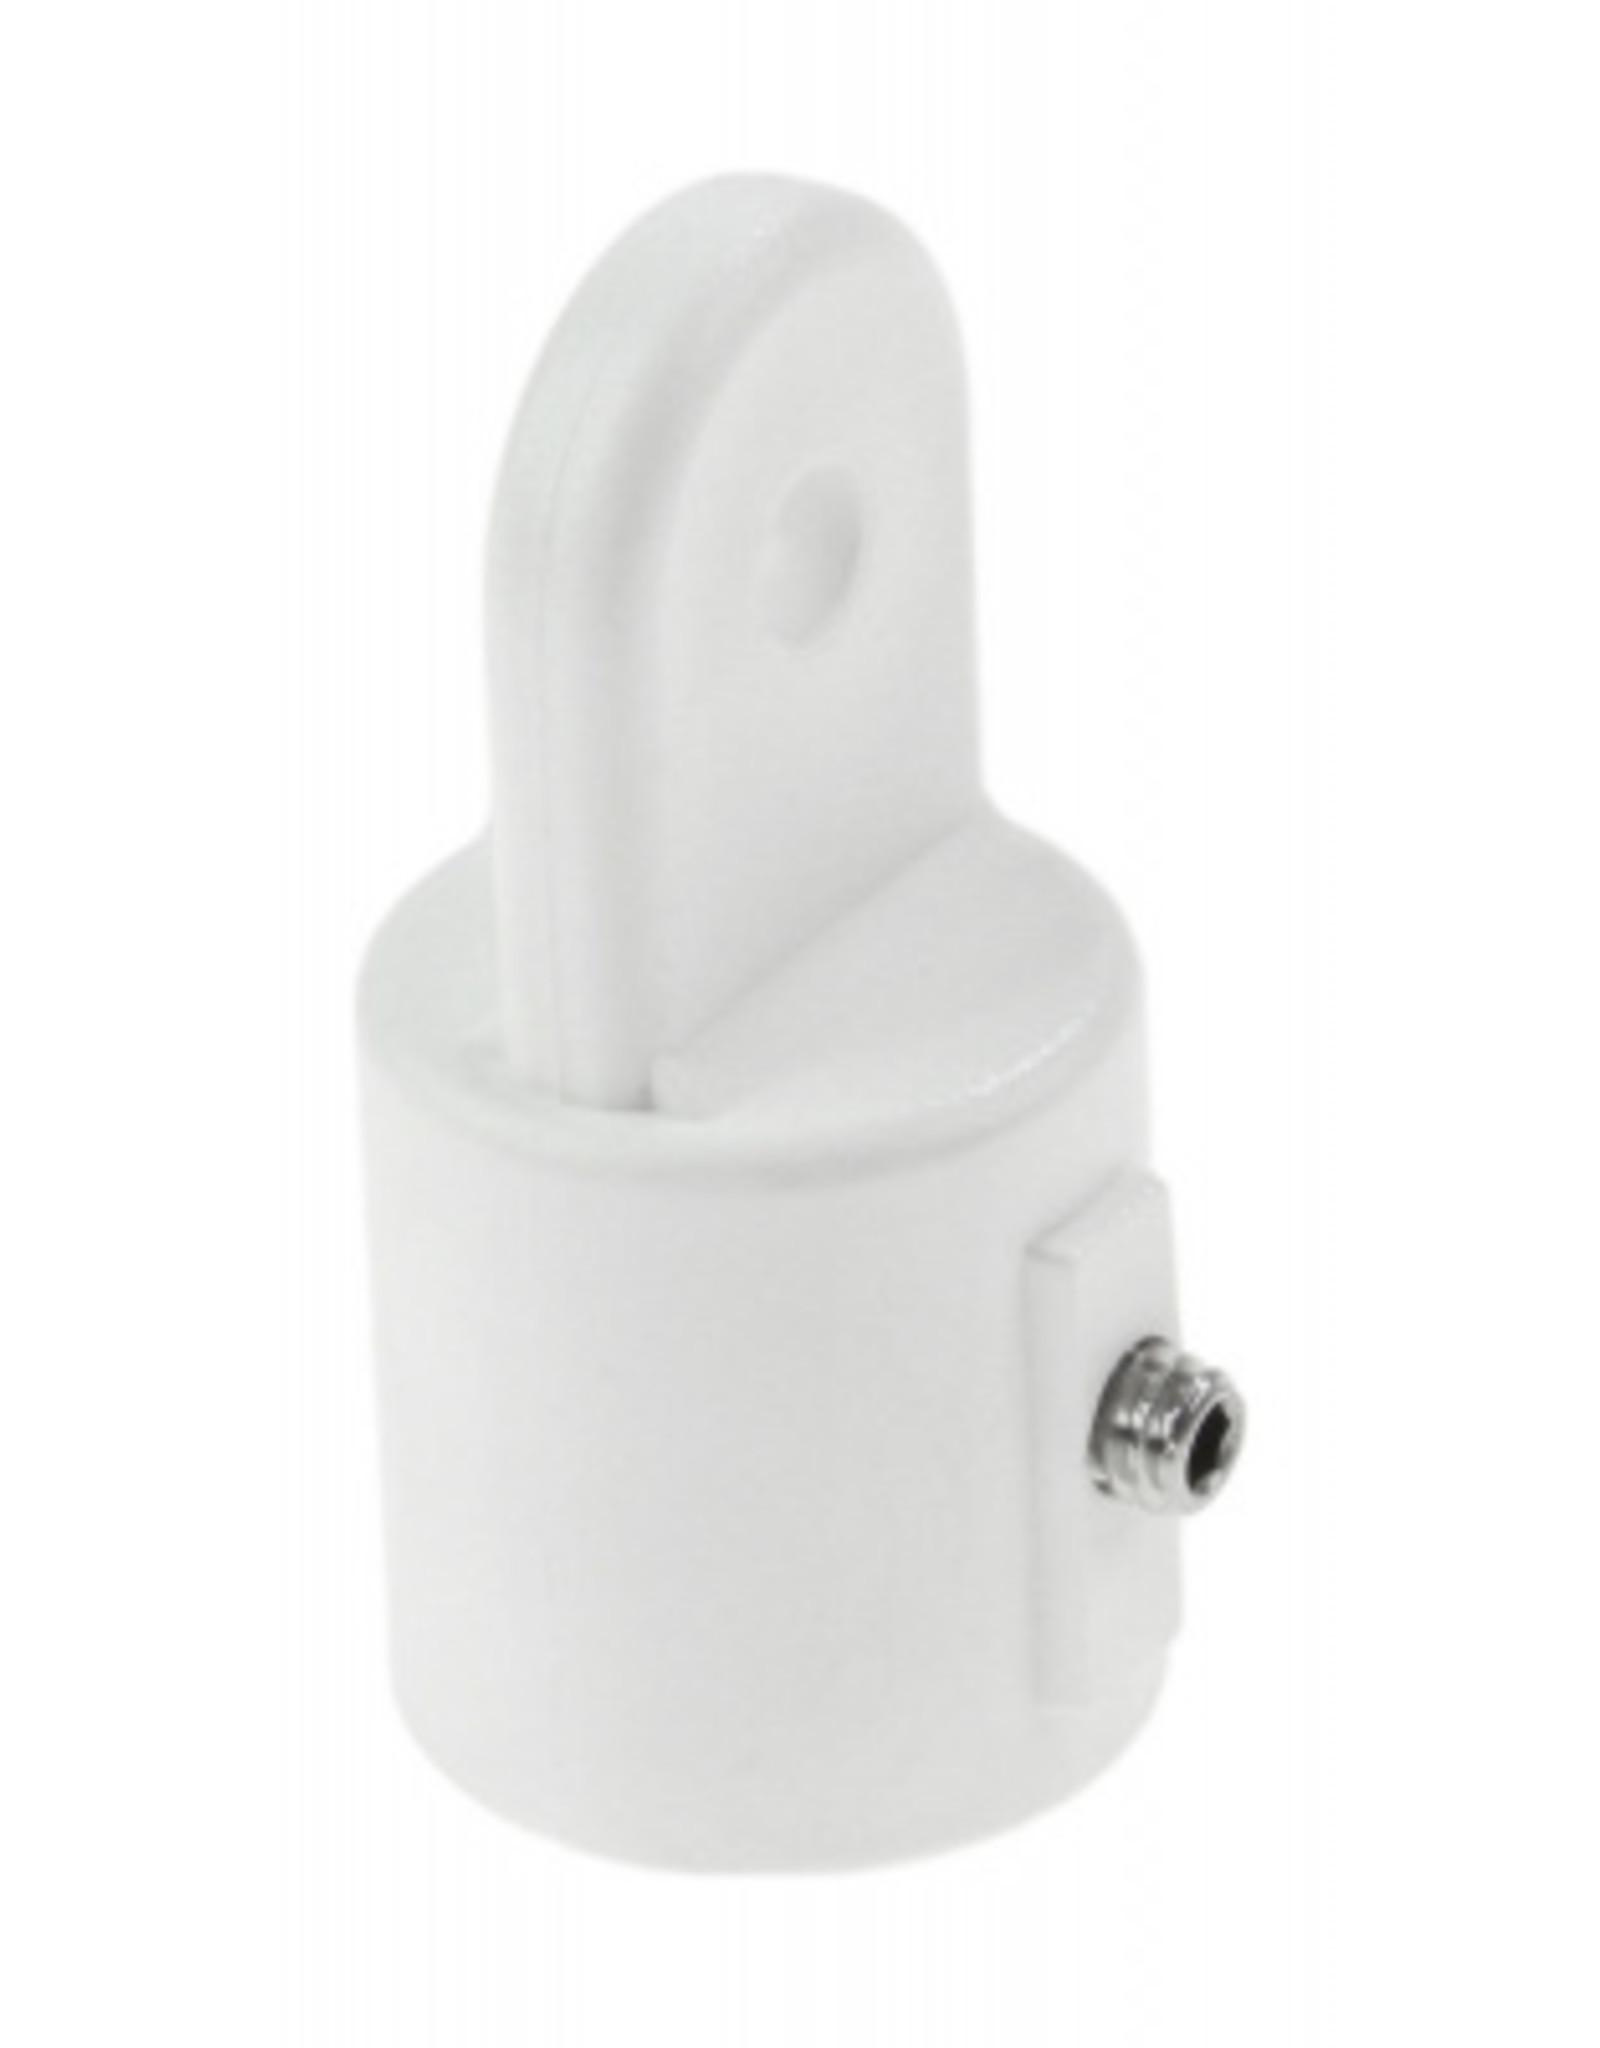 Bimini top eind dop wit/RVS